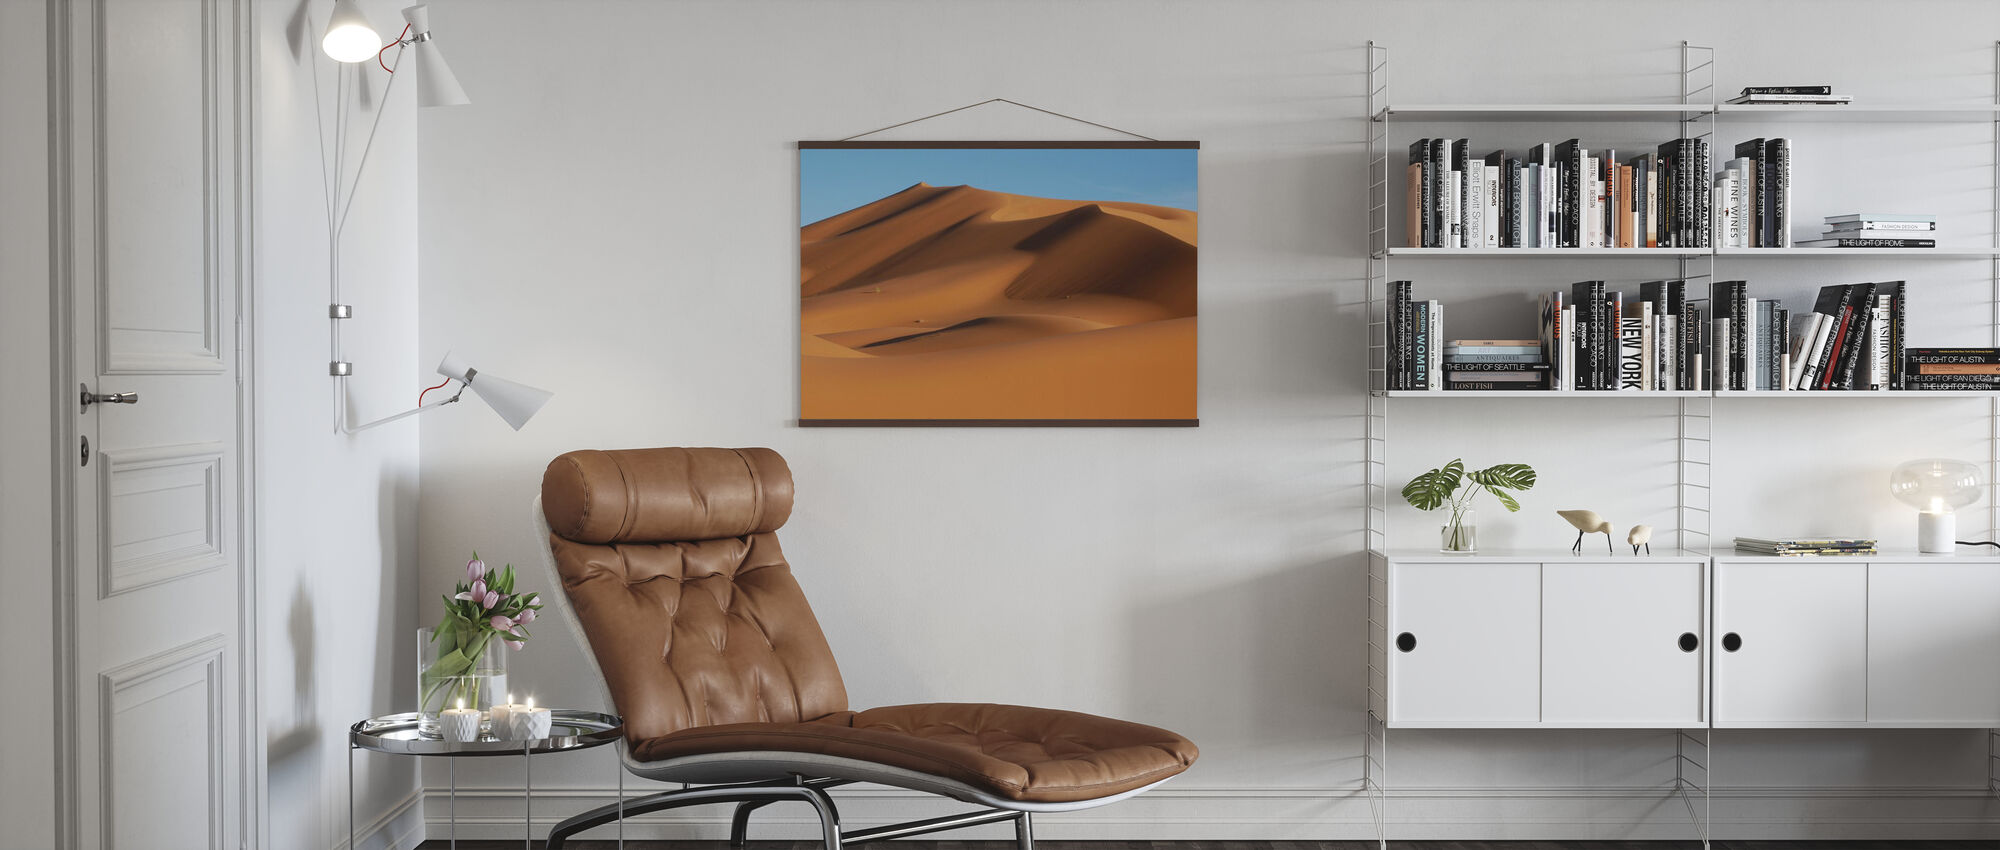 Sahara woestijn - Poster - Woonkamer